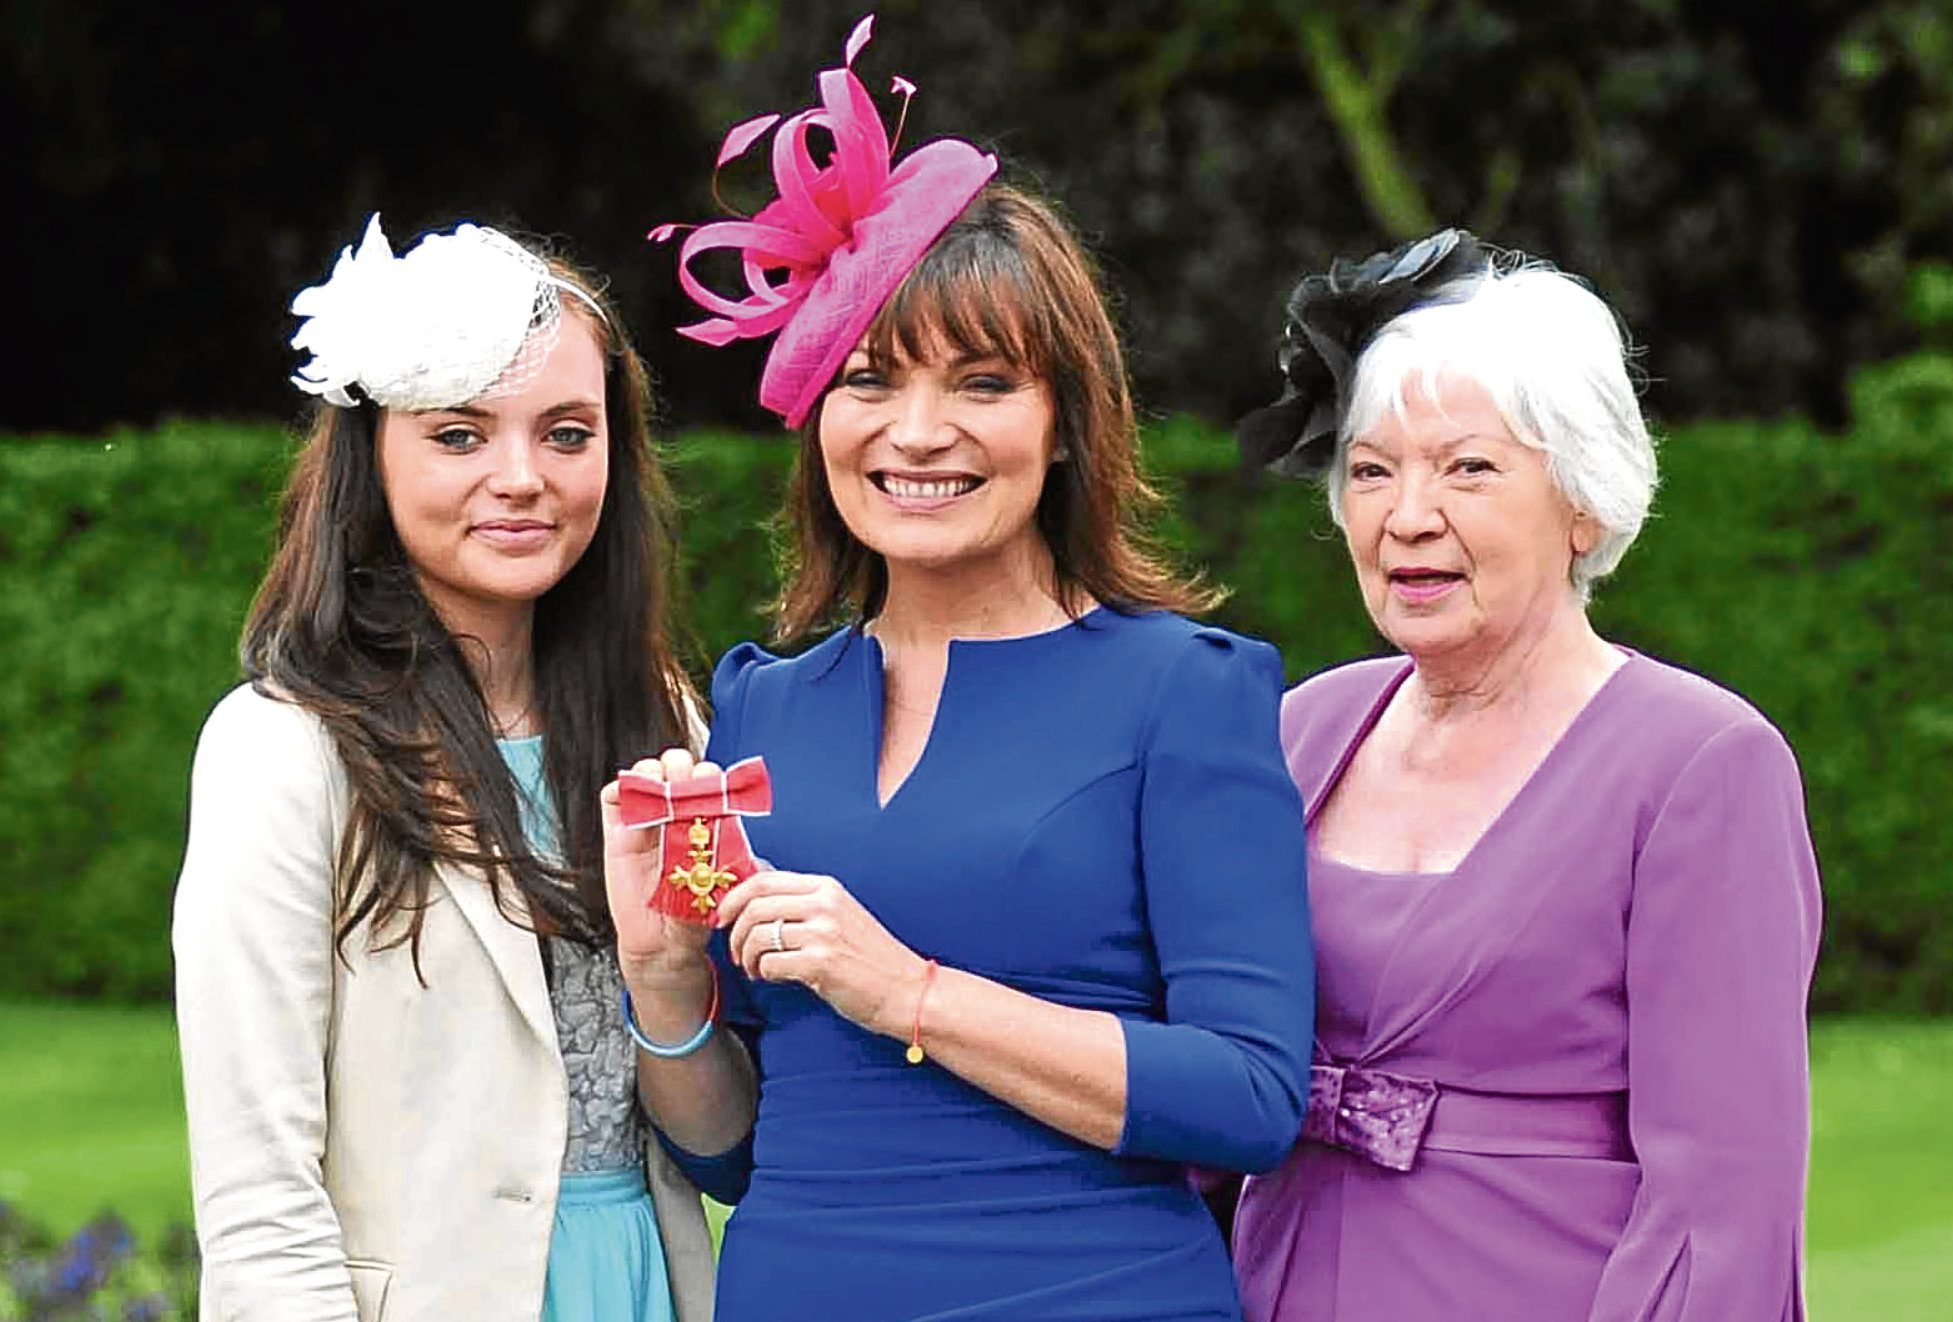 Lorraine Kelly gets her MBE with L-R daughter Rosie, Lorraine, and mum Anne